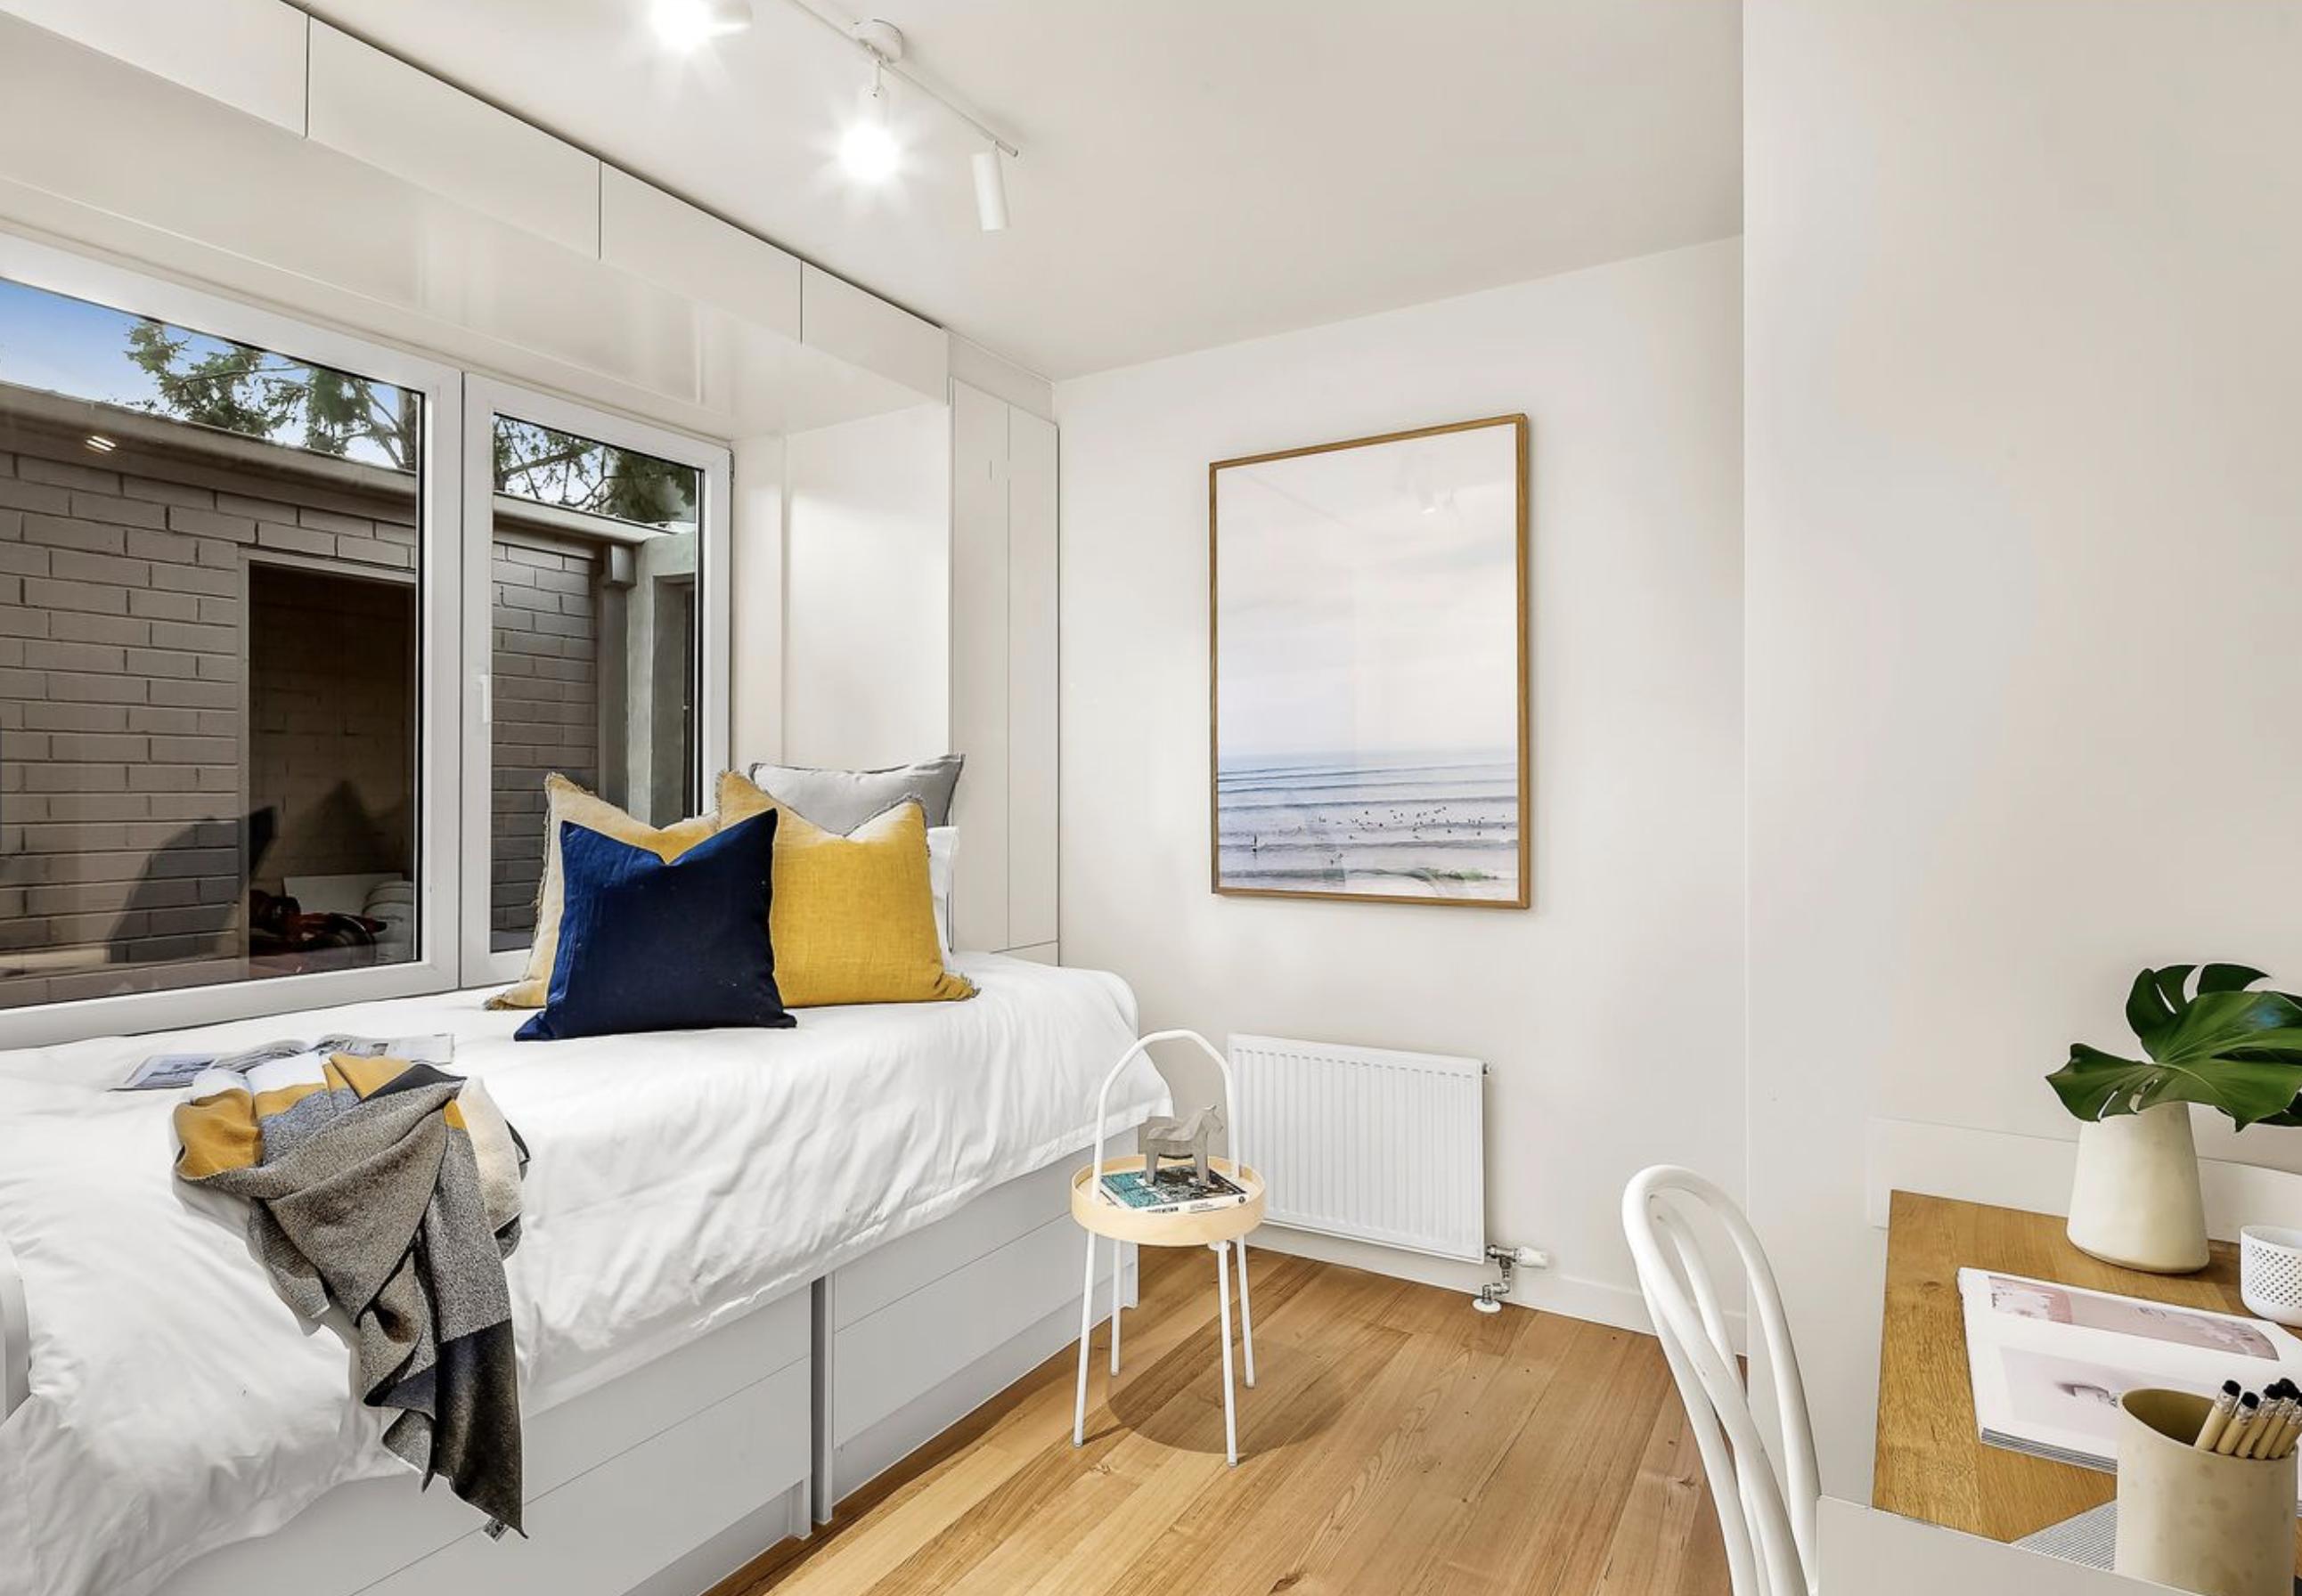 Bedroom windows replacement, Armadale, Melbourne.